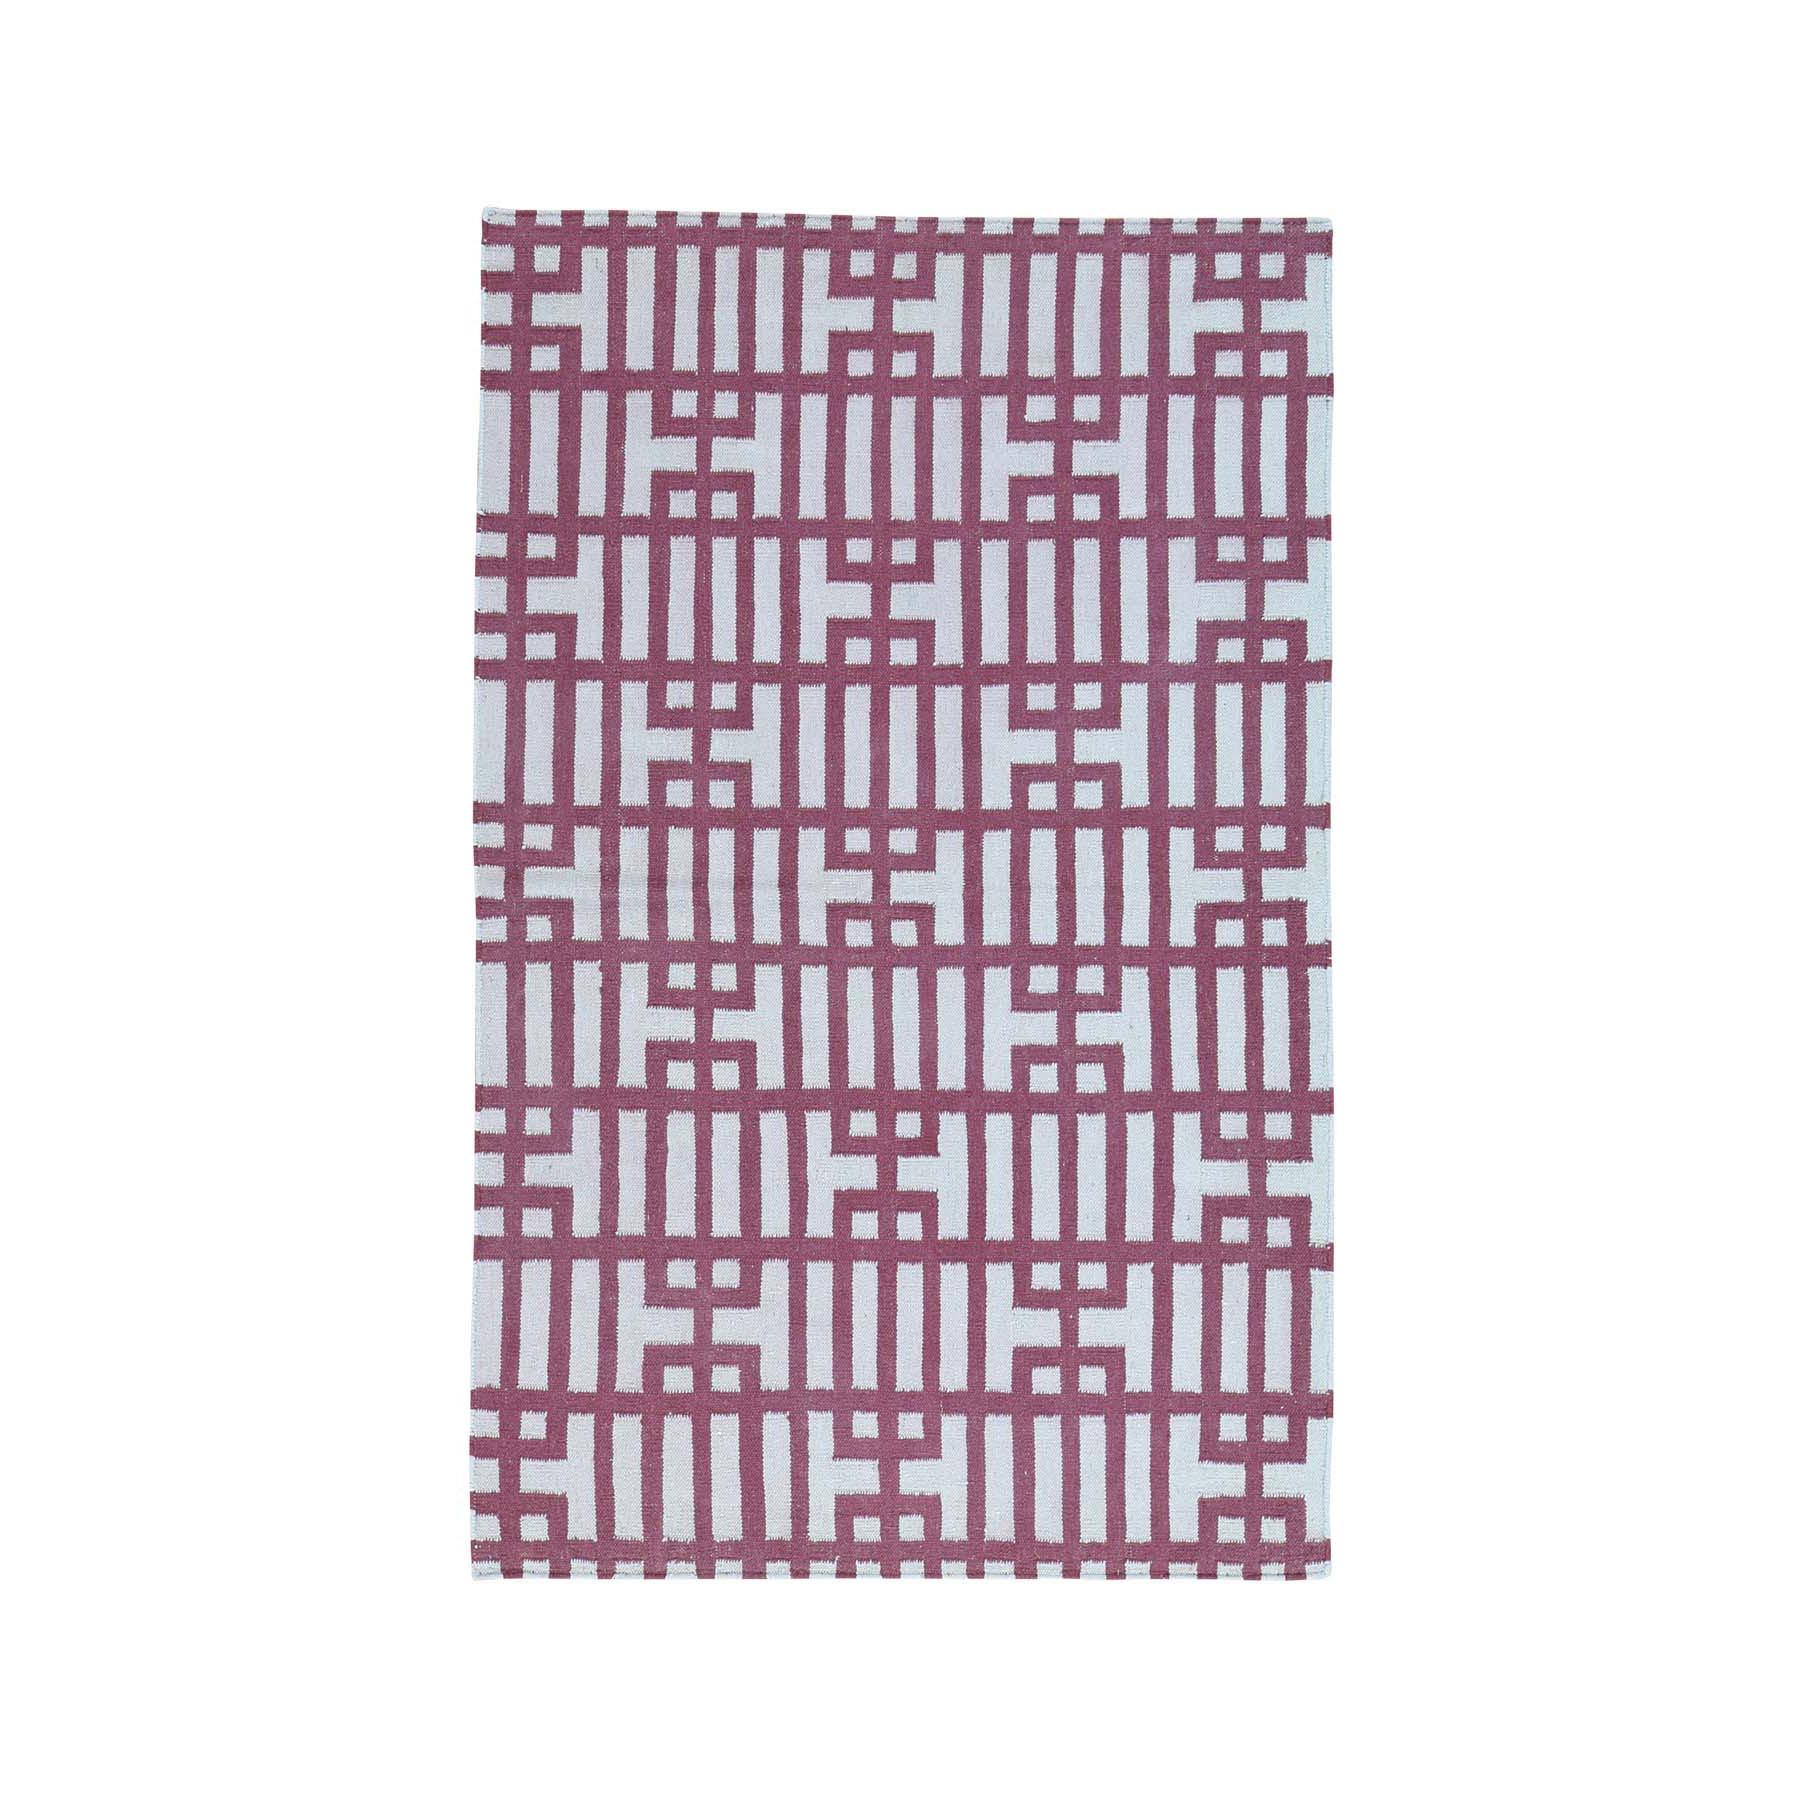 "4'X6'2"" Hand-Woven Reversible Kilim Geometric Design Flat Weave Rug moacb0a6"